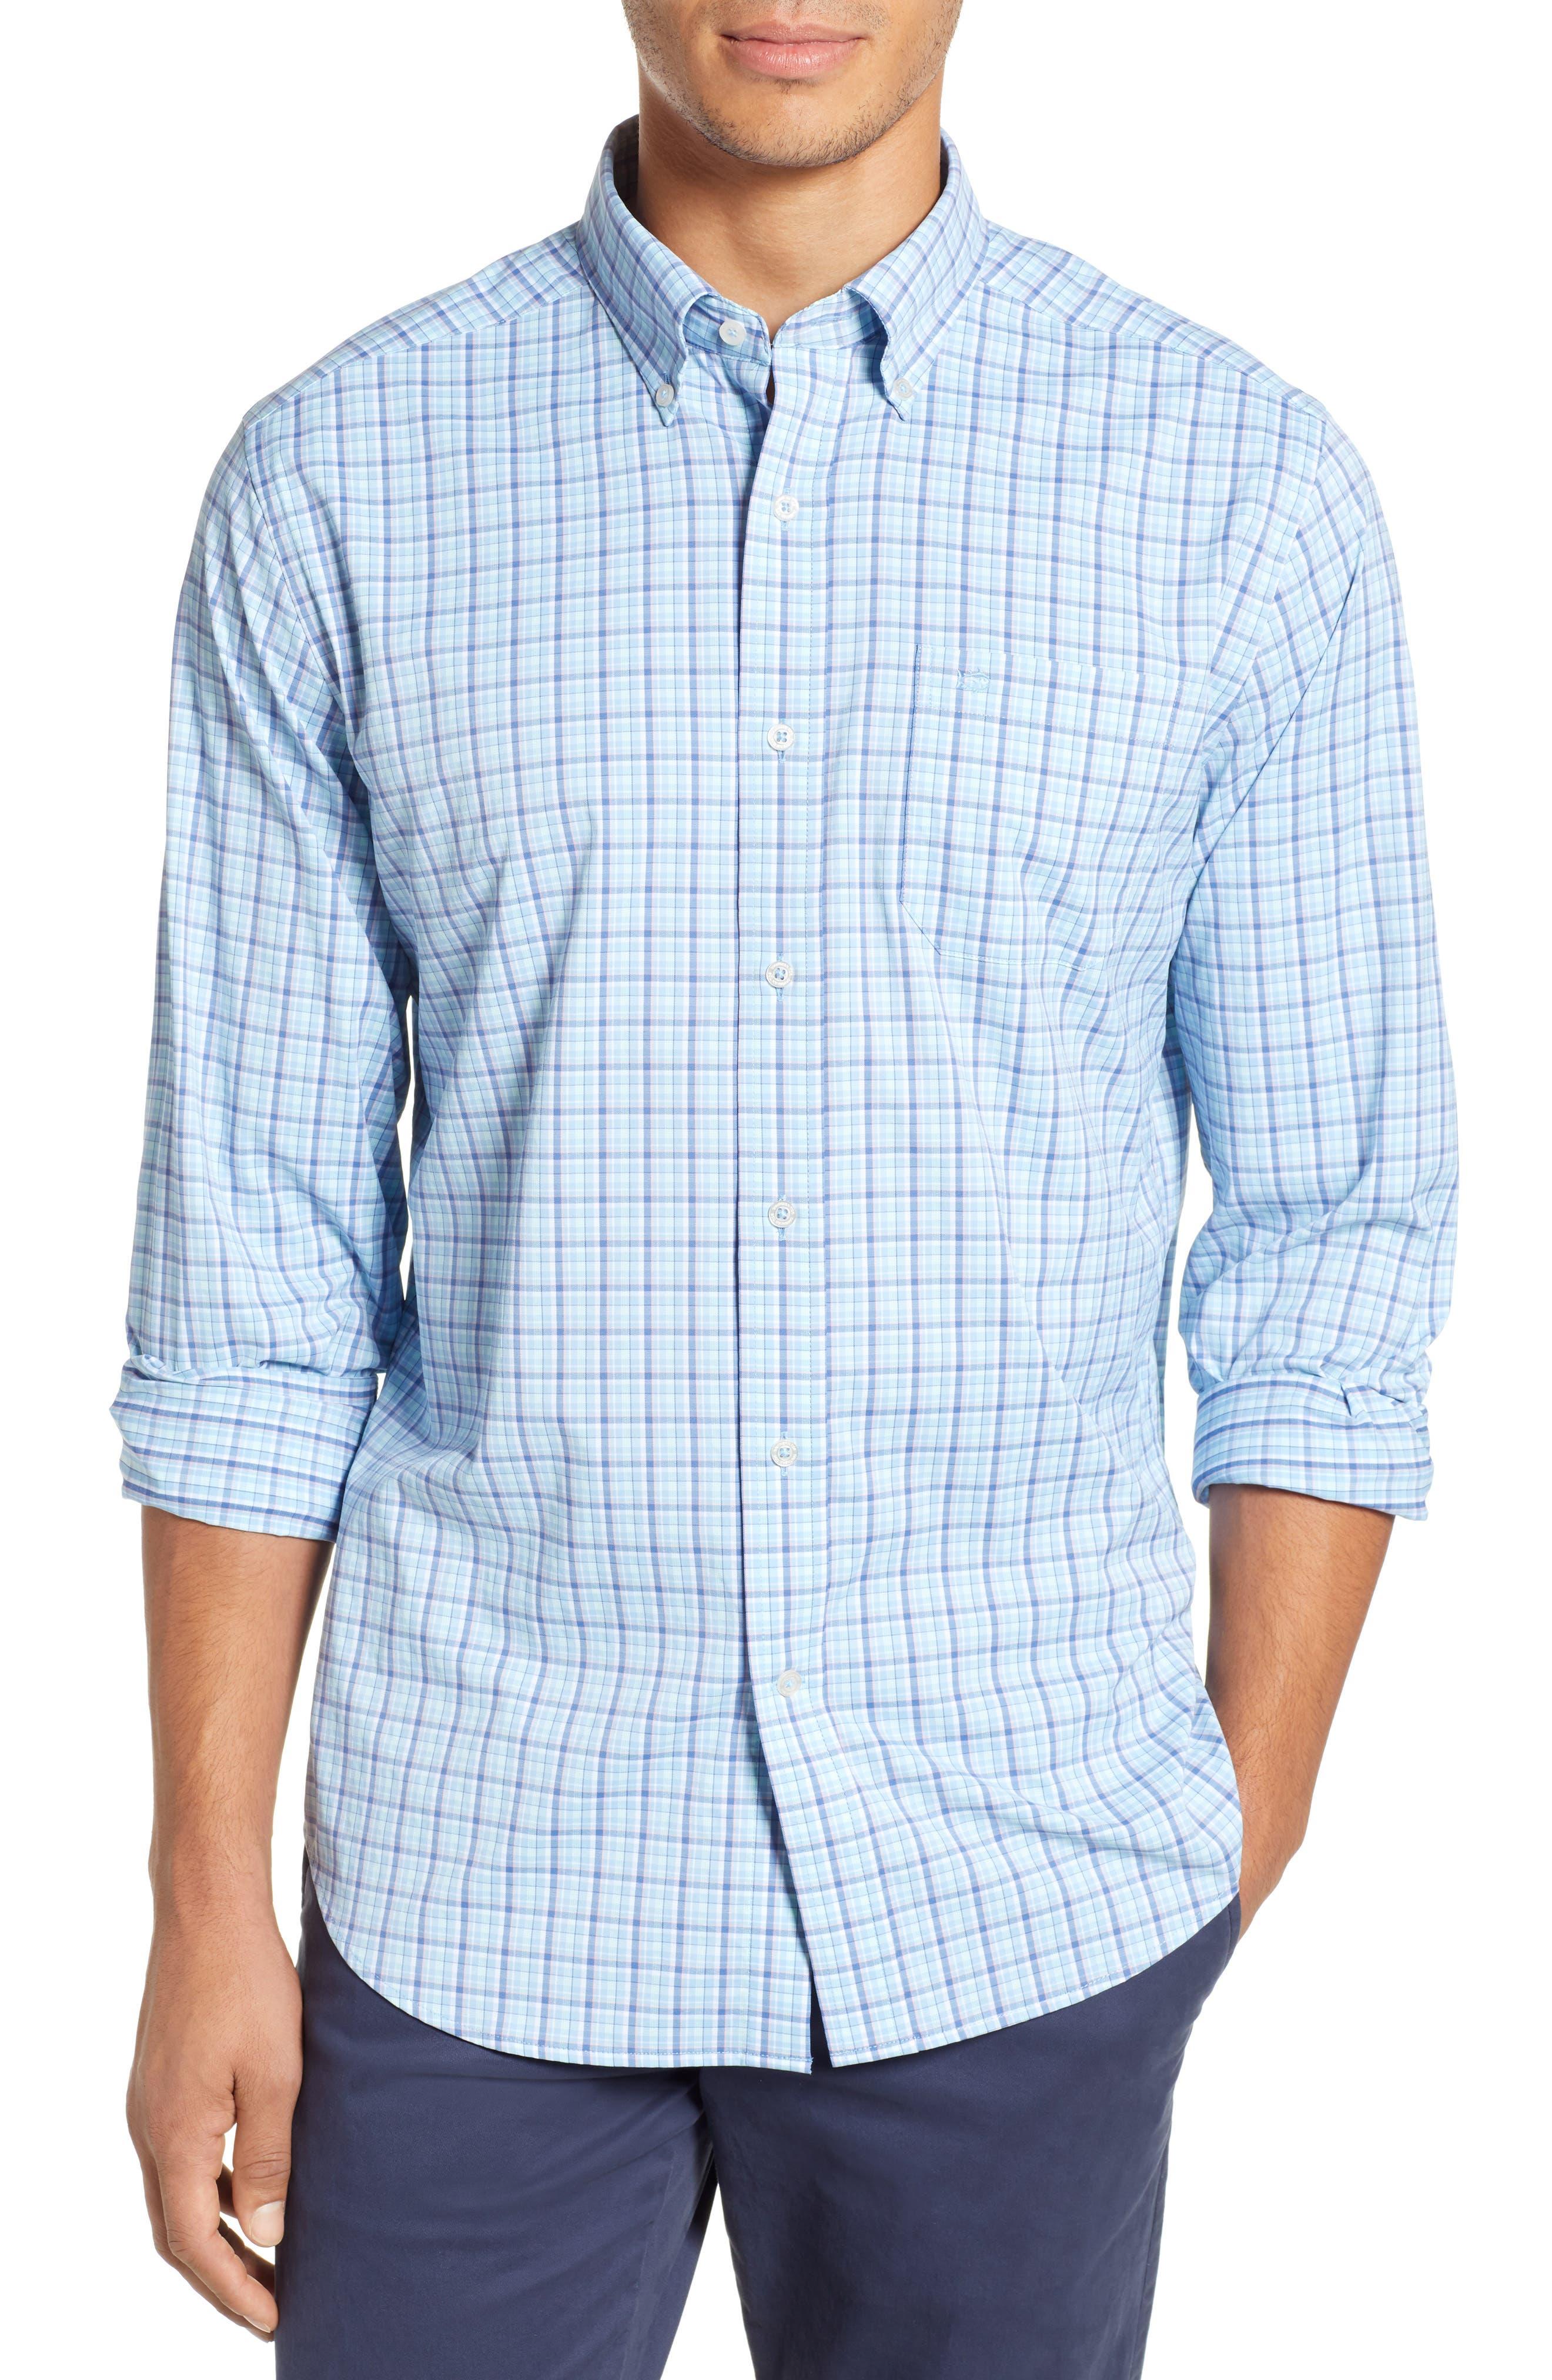 Staycation Intercoastal Regular Fit Plaid Performance Sport Shirt,                             Main thumbnail 1, color,                             SKY BLUE